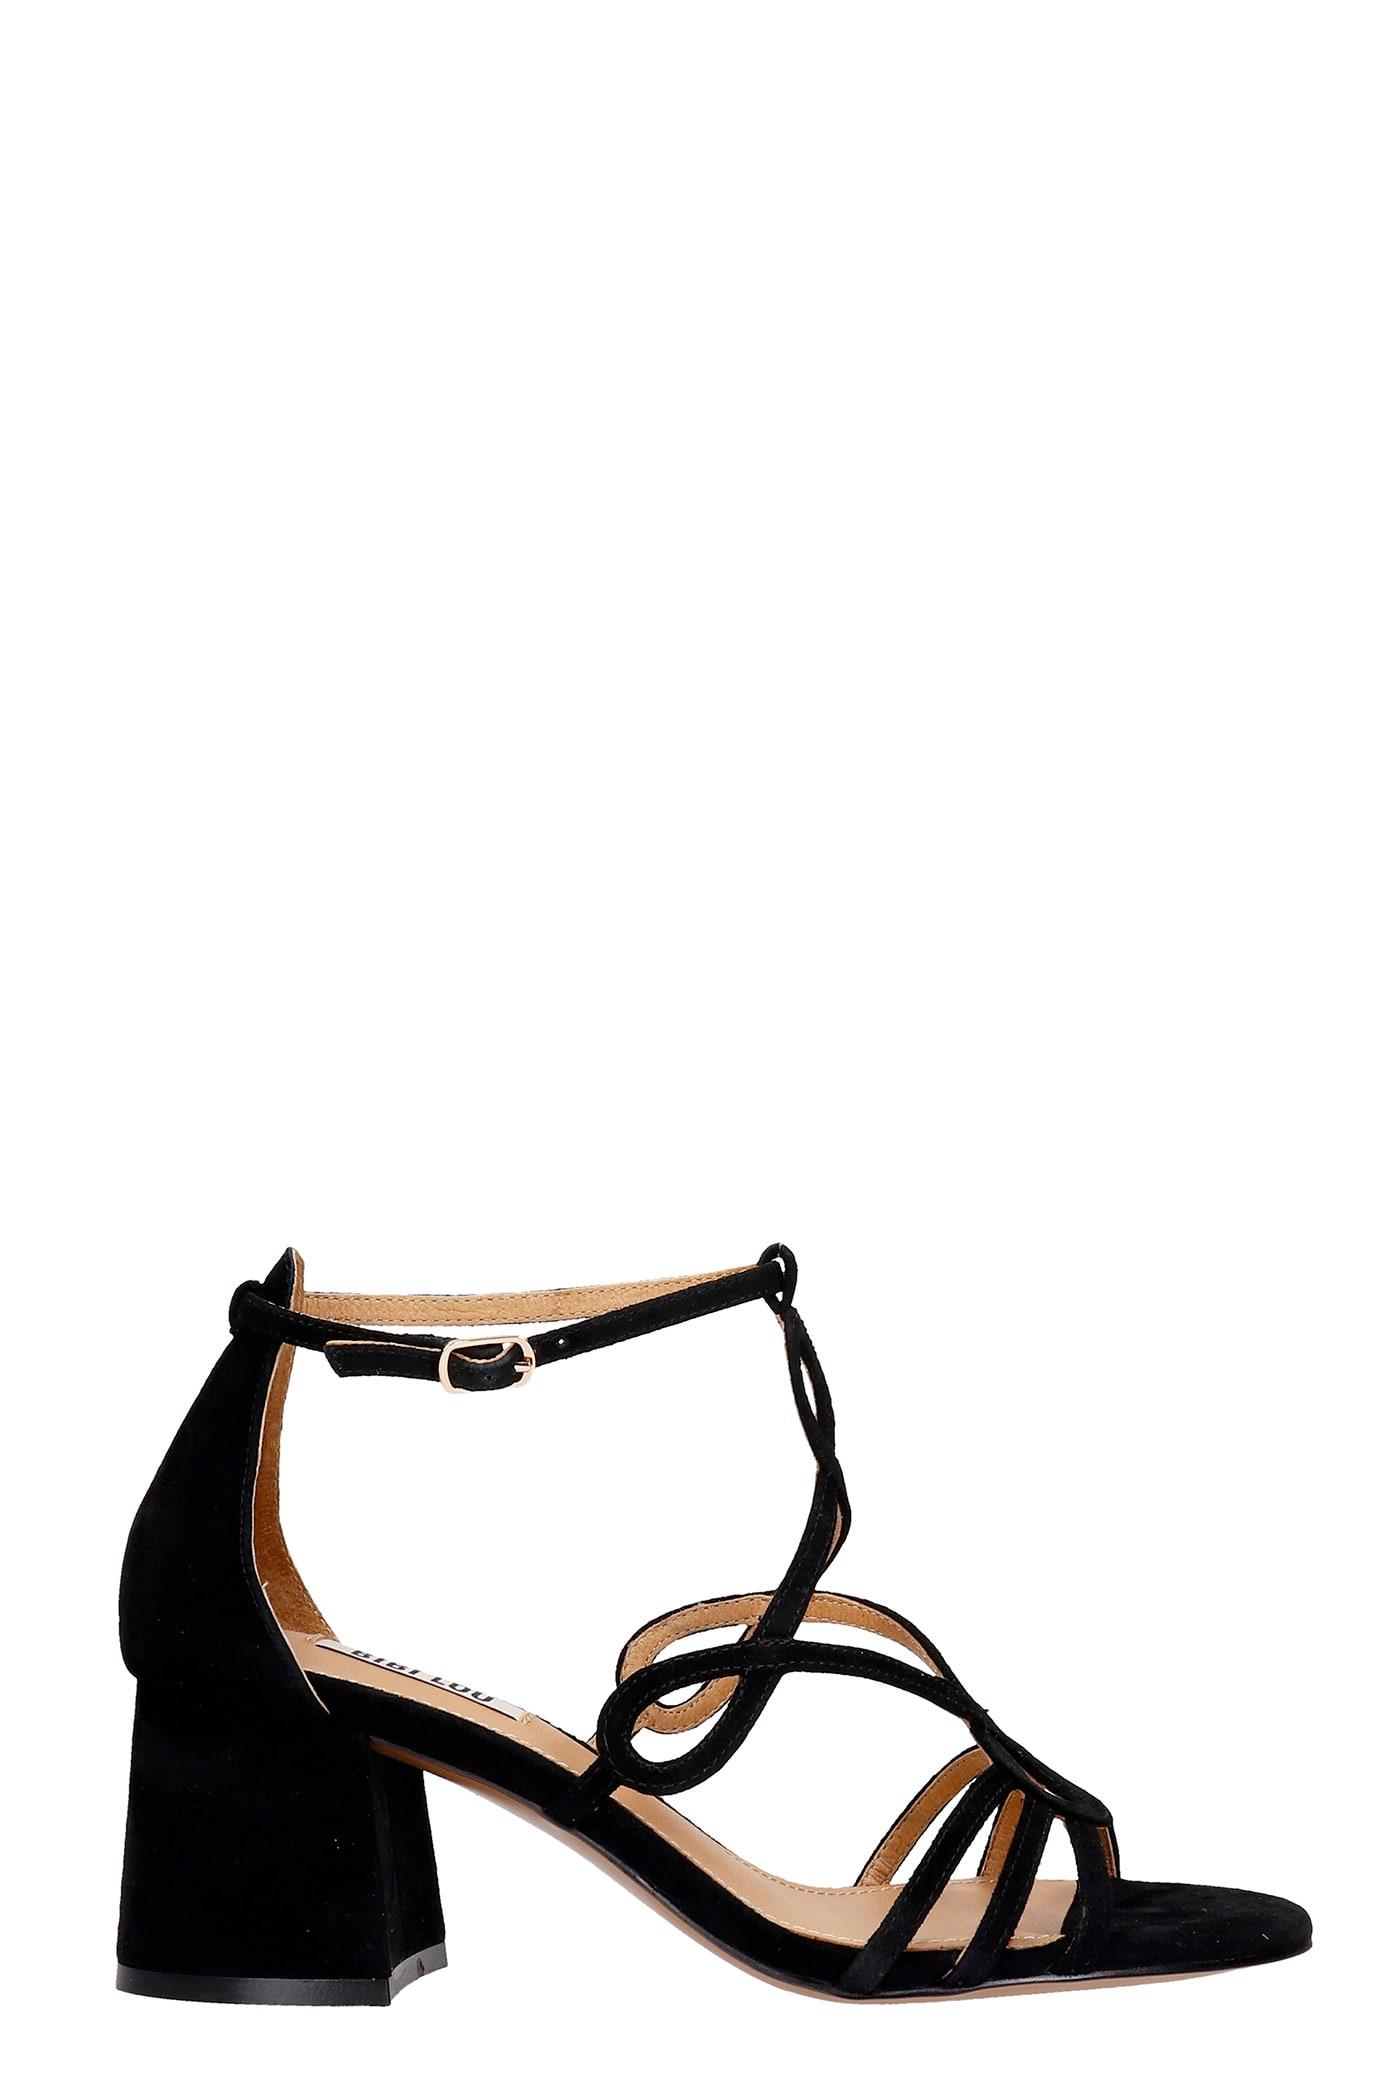 Sandals In Black Suede